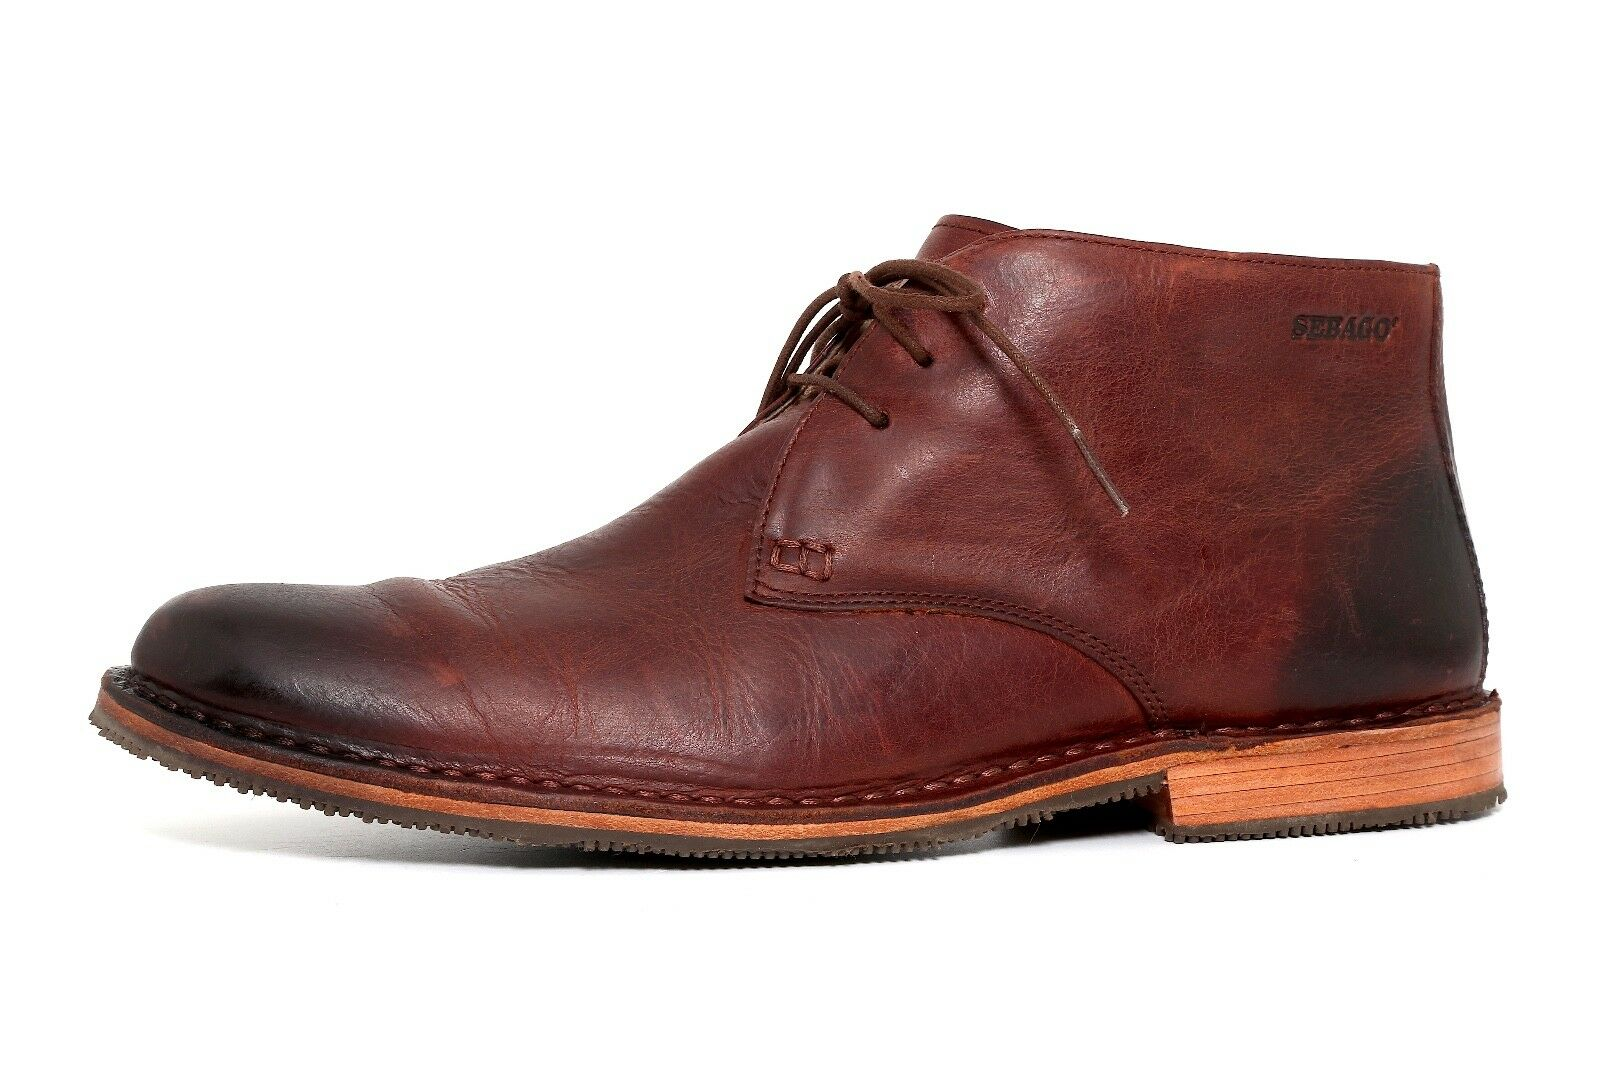 Sebago Dark Brown Leather Men Oxford Size 10D 2011